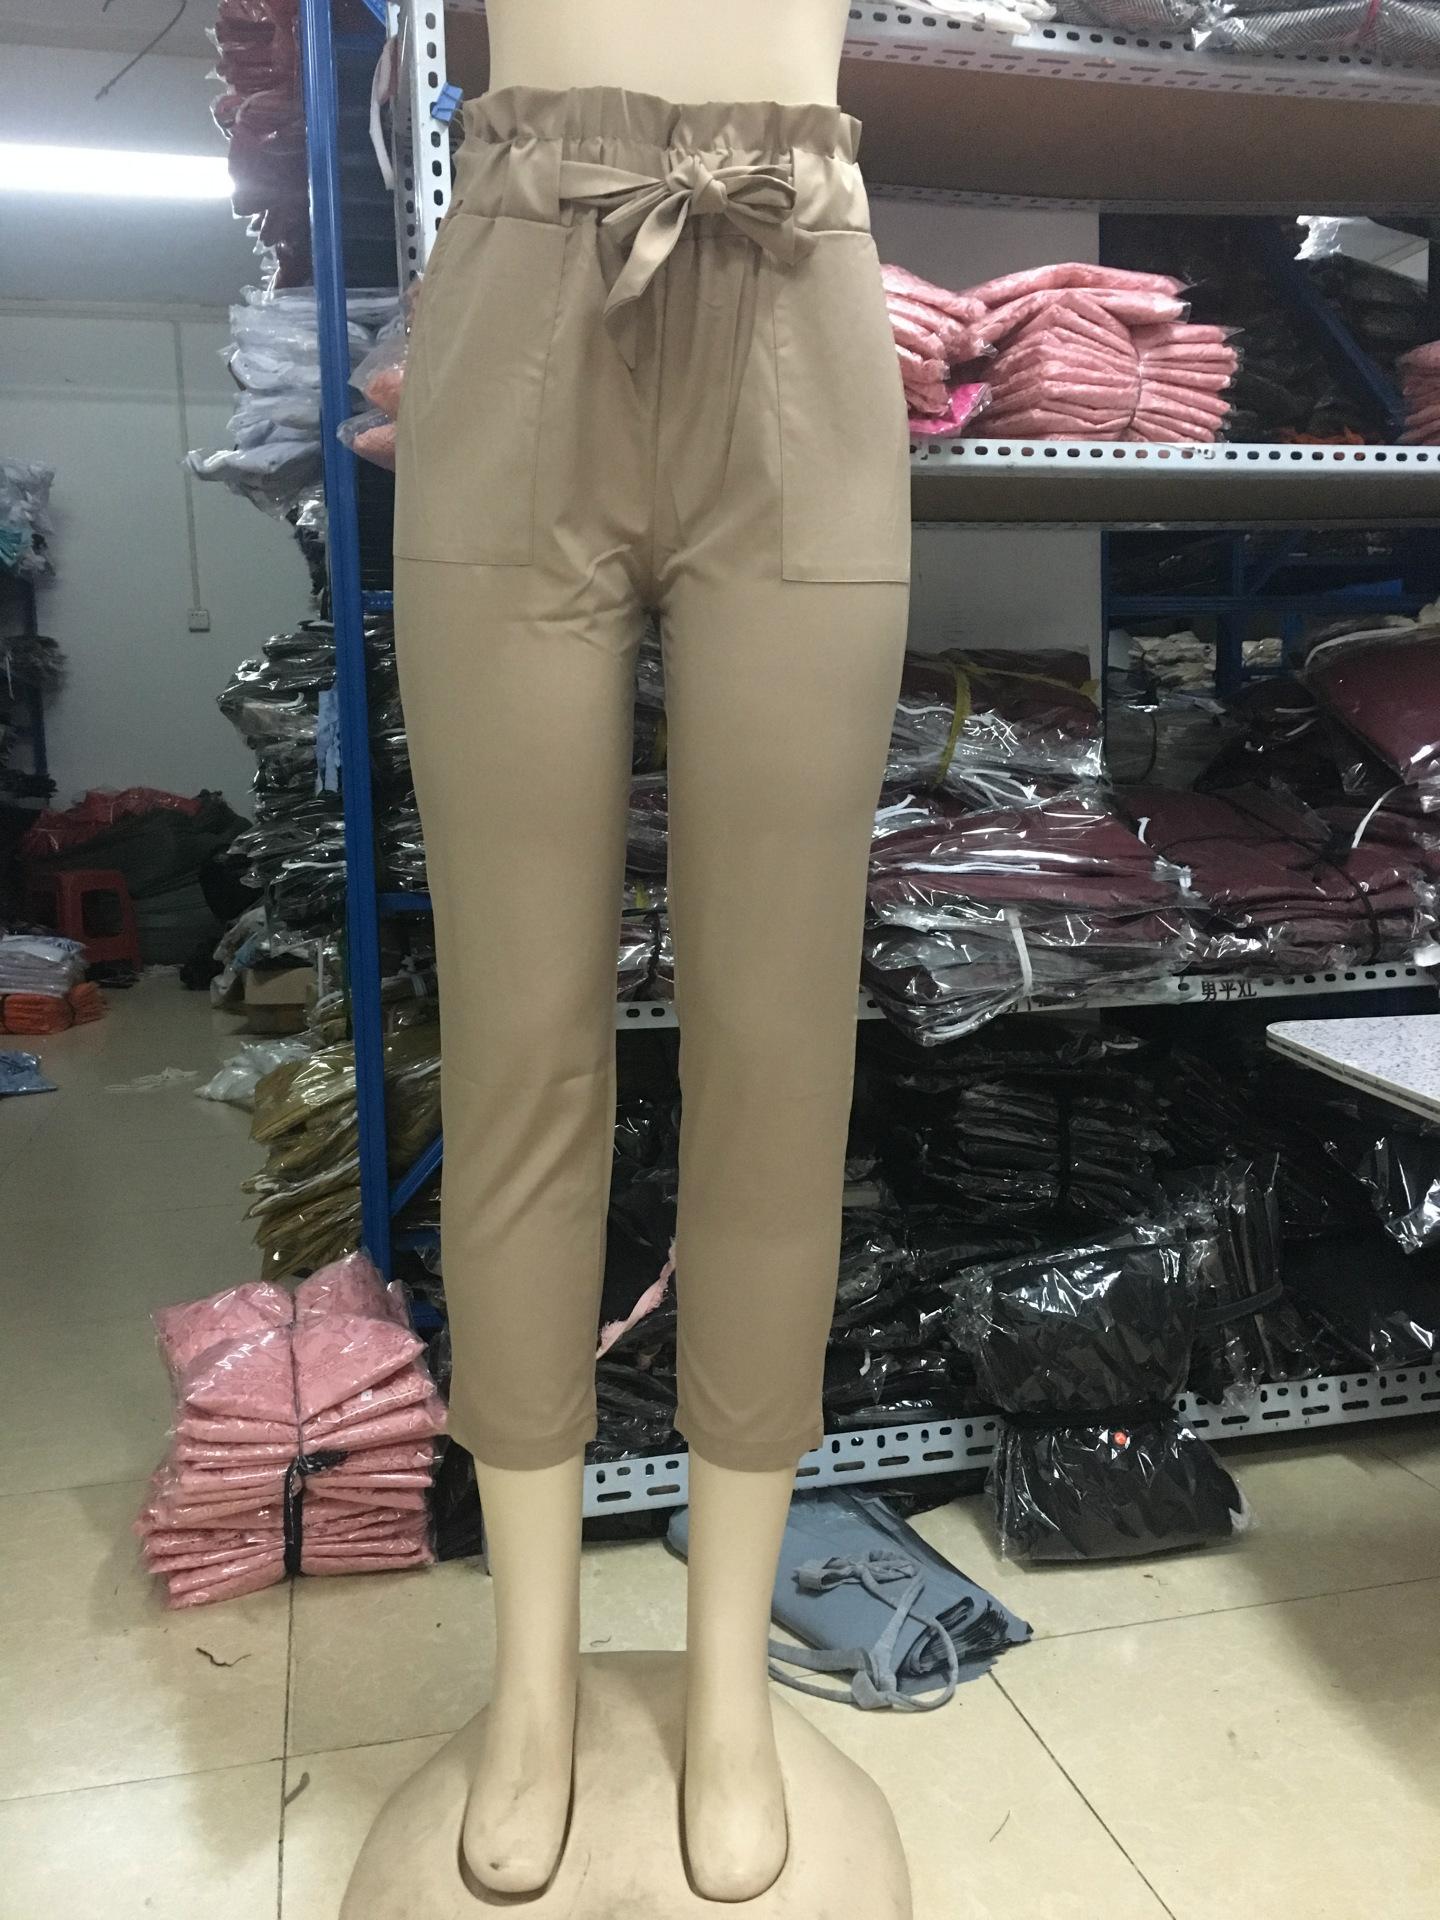 19 New Brand High Elastic Waist Harem Pants Women Spring Summer Fashion Ninth Pants Female Office Lady Black Trousers Belt 11